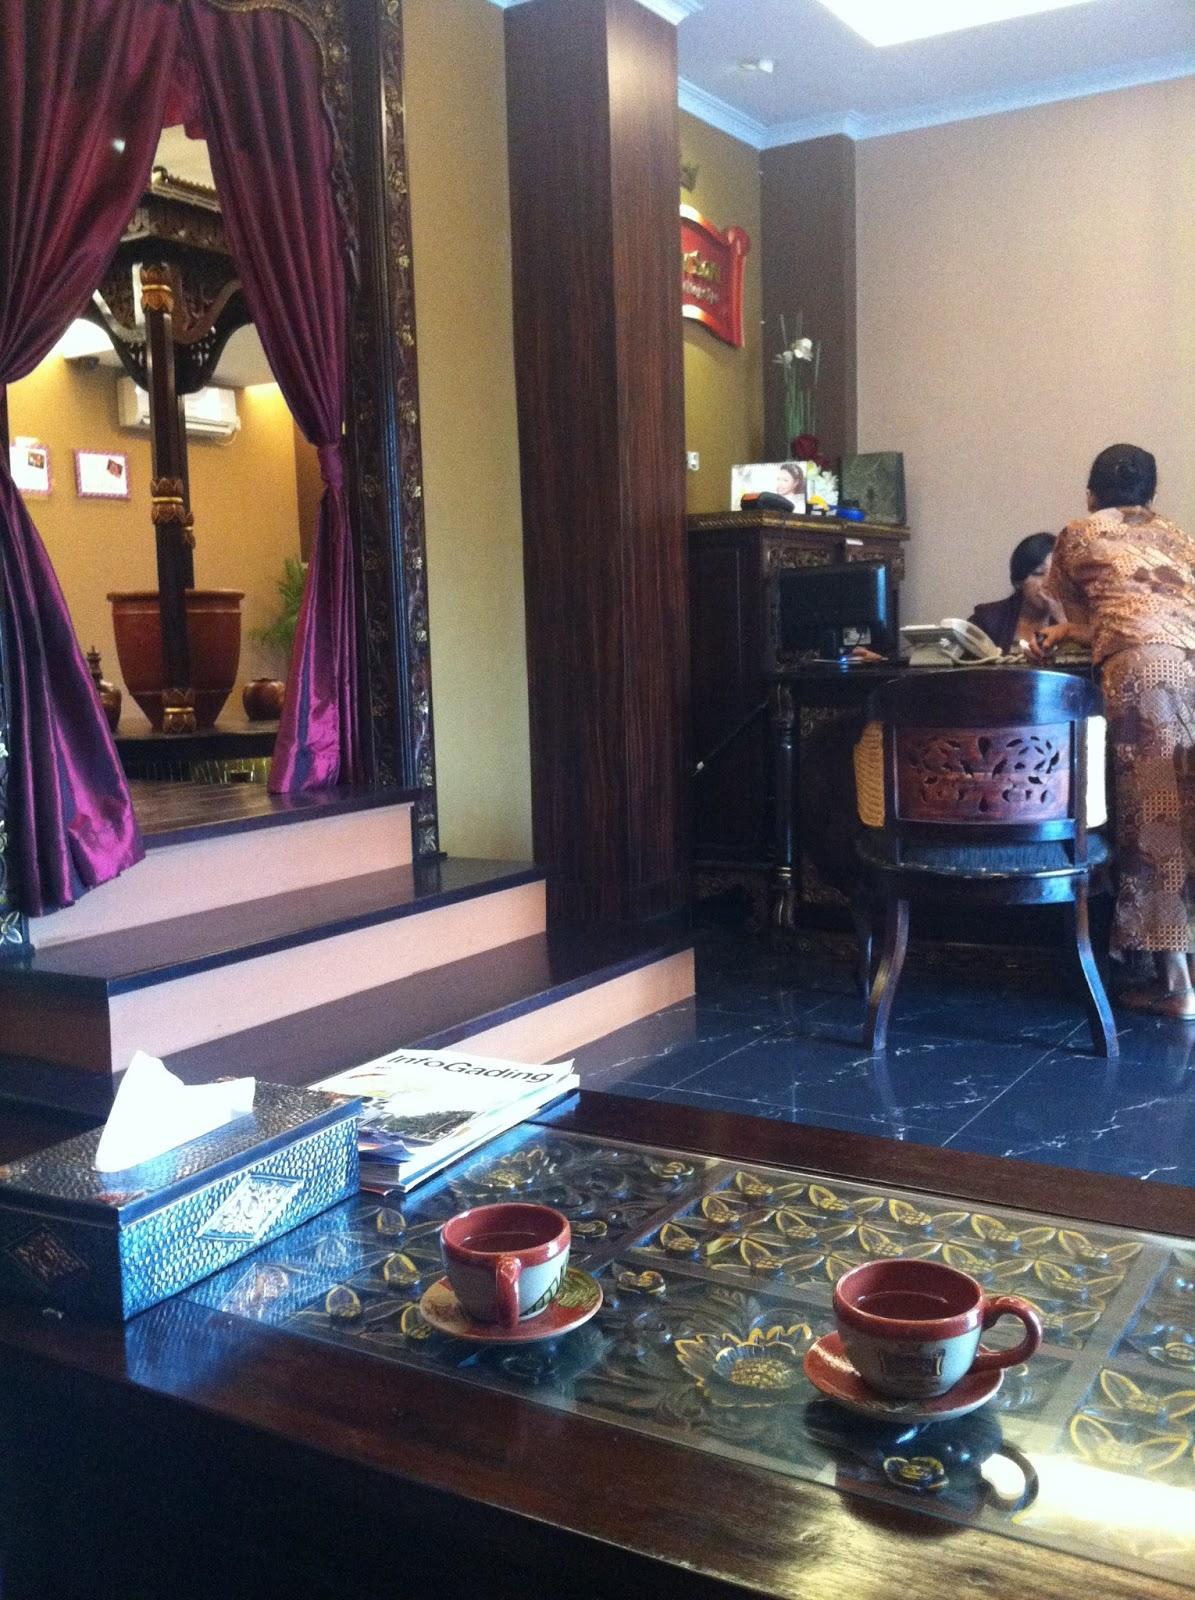 house of fun taman sari royal heritage spa kelapa gading review rh angieachmad blogspot com spa di kelapa gading 2018 spa di kelapa gading terbaru